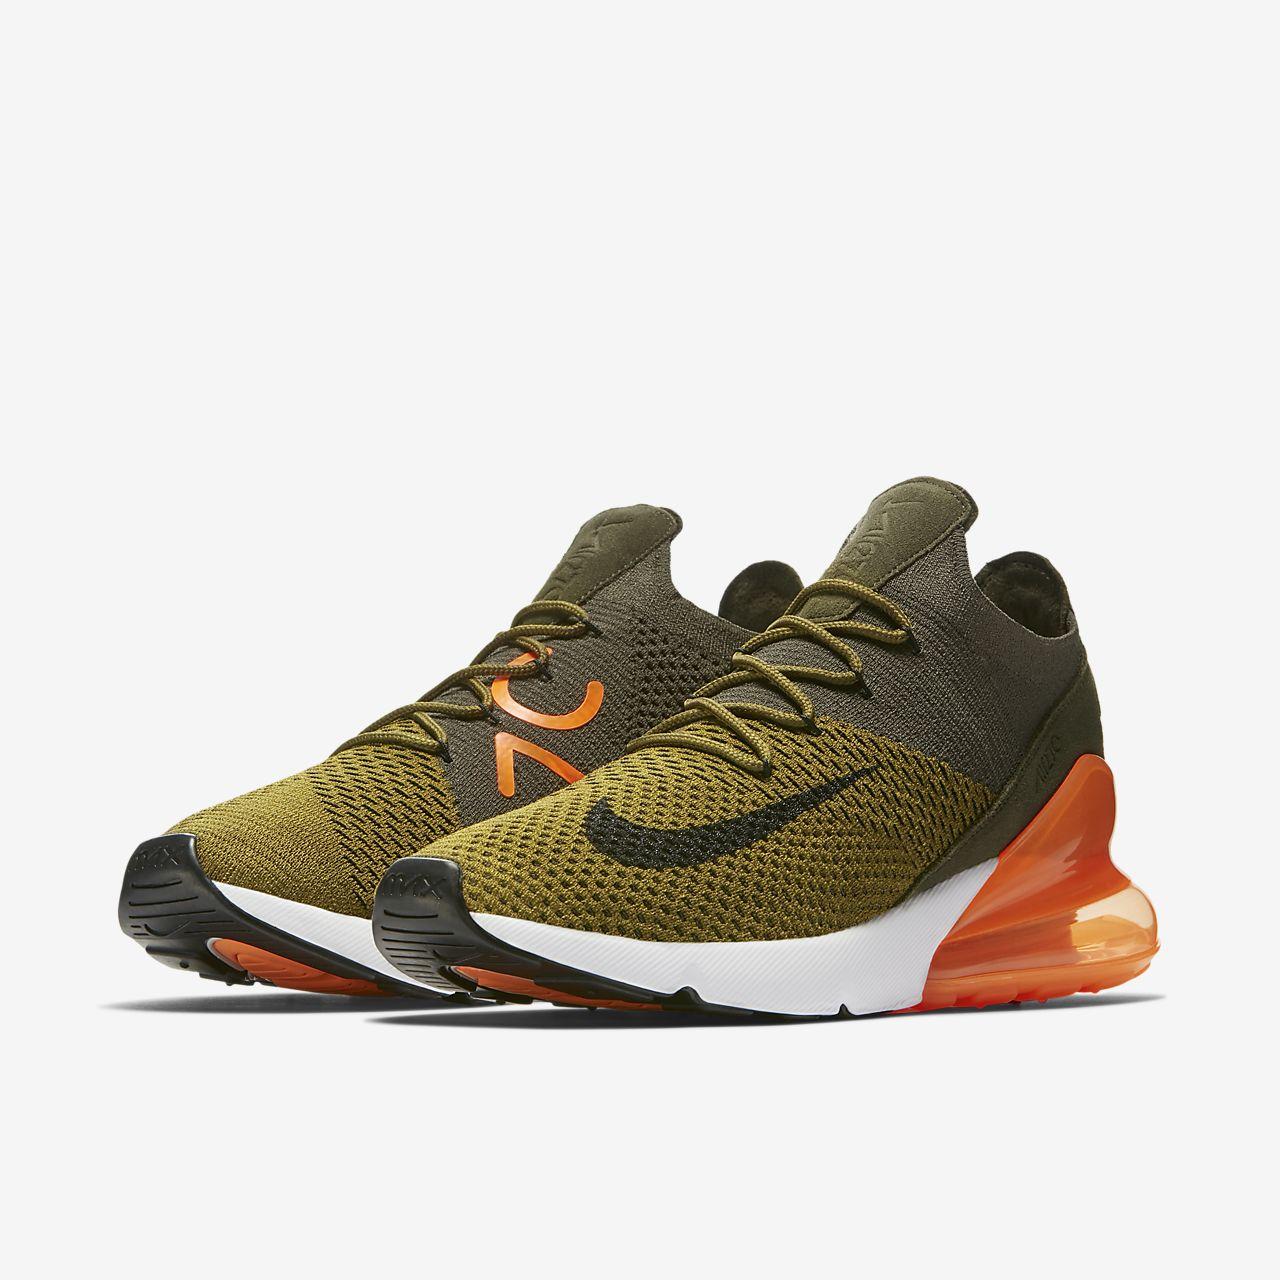 Nike Air Max 270 Flyknit Men's AU